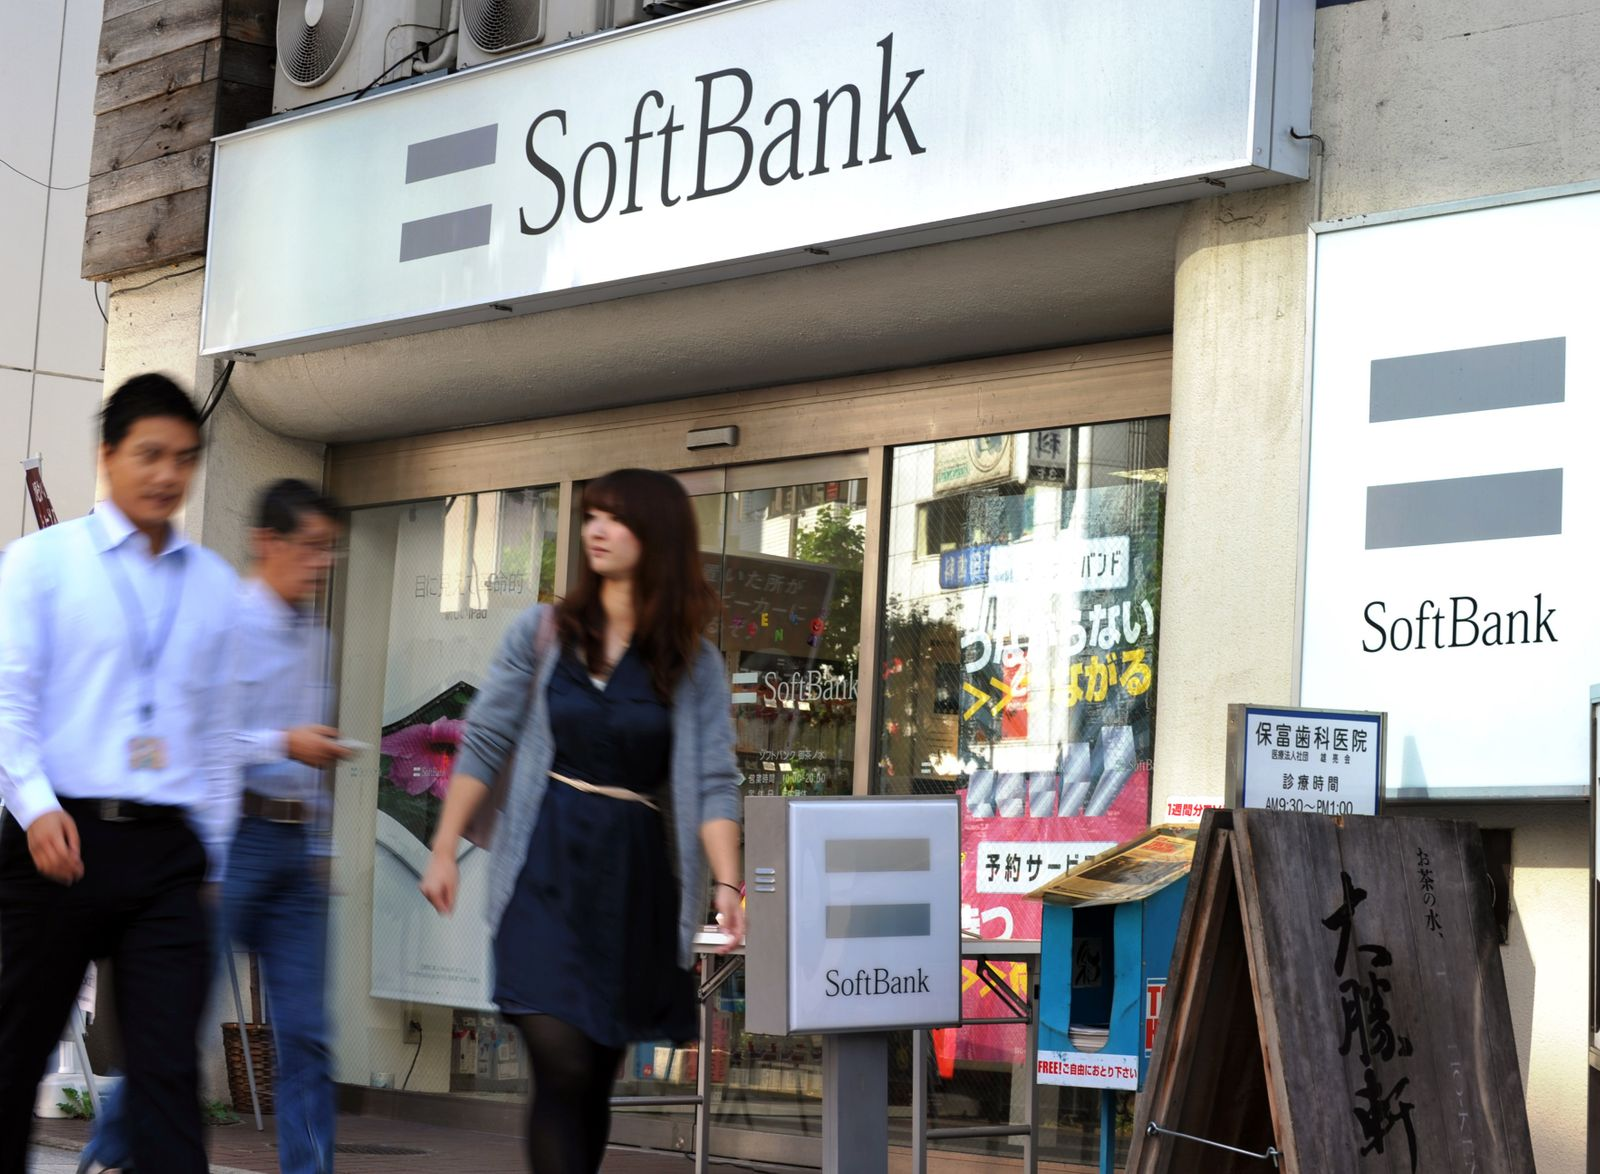 Softbank / Mobilfunk